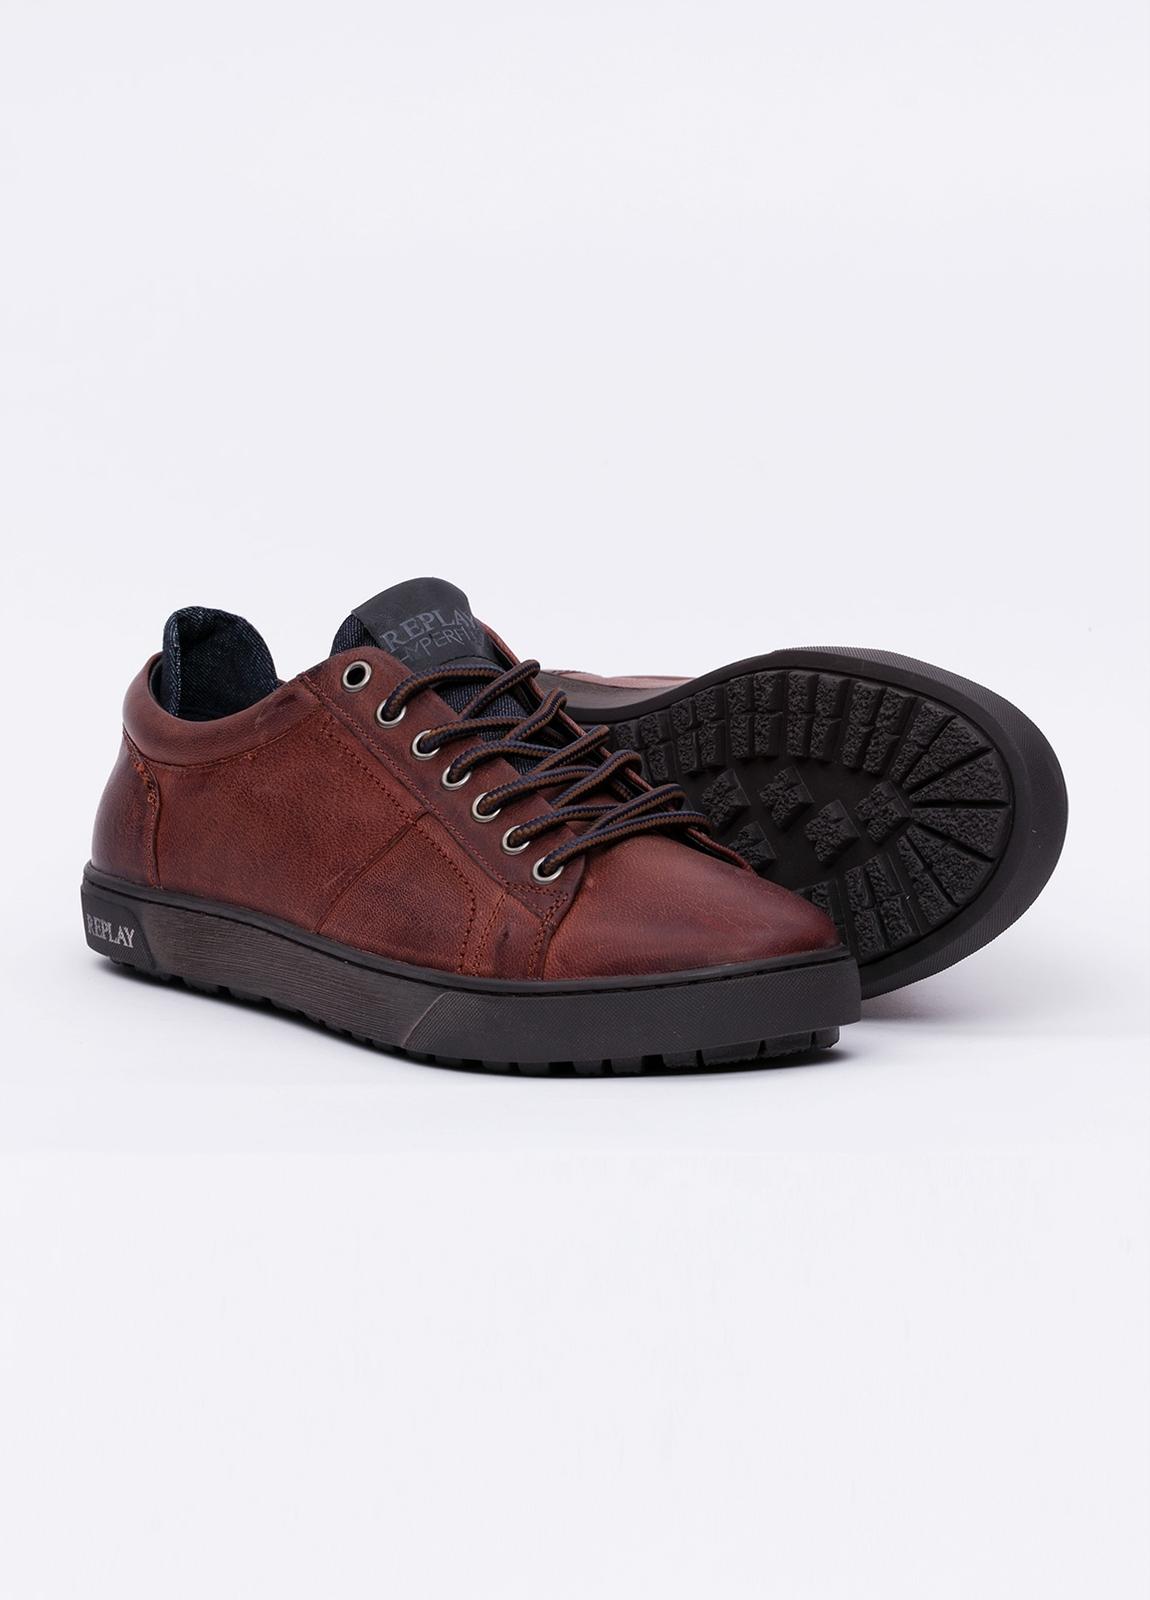 Calzado sport modelo LAREM color marrón. 100% Piel. - Ítem1